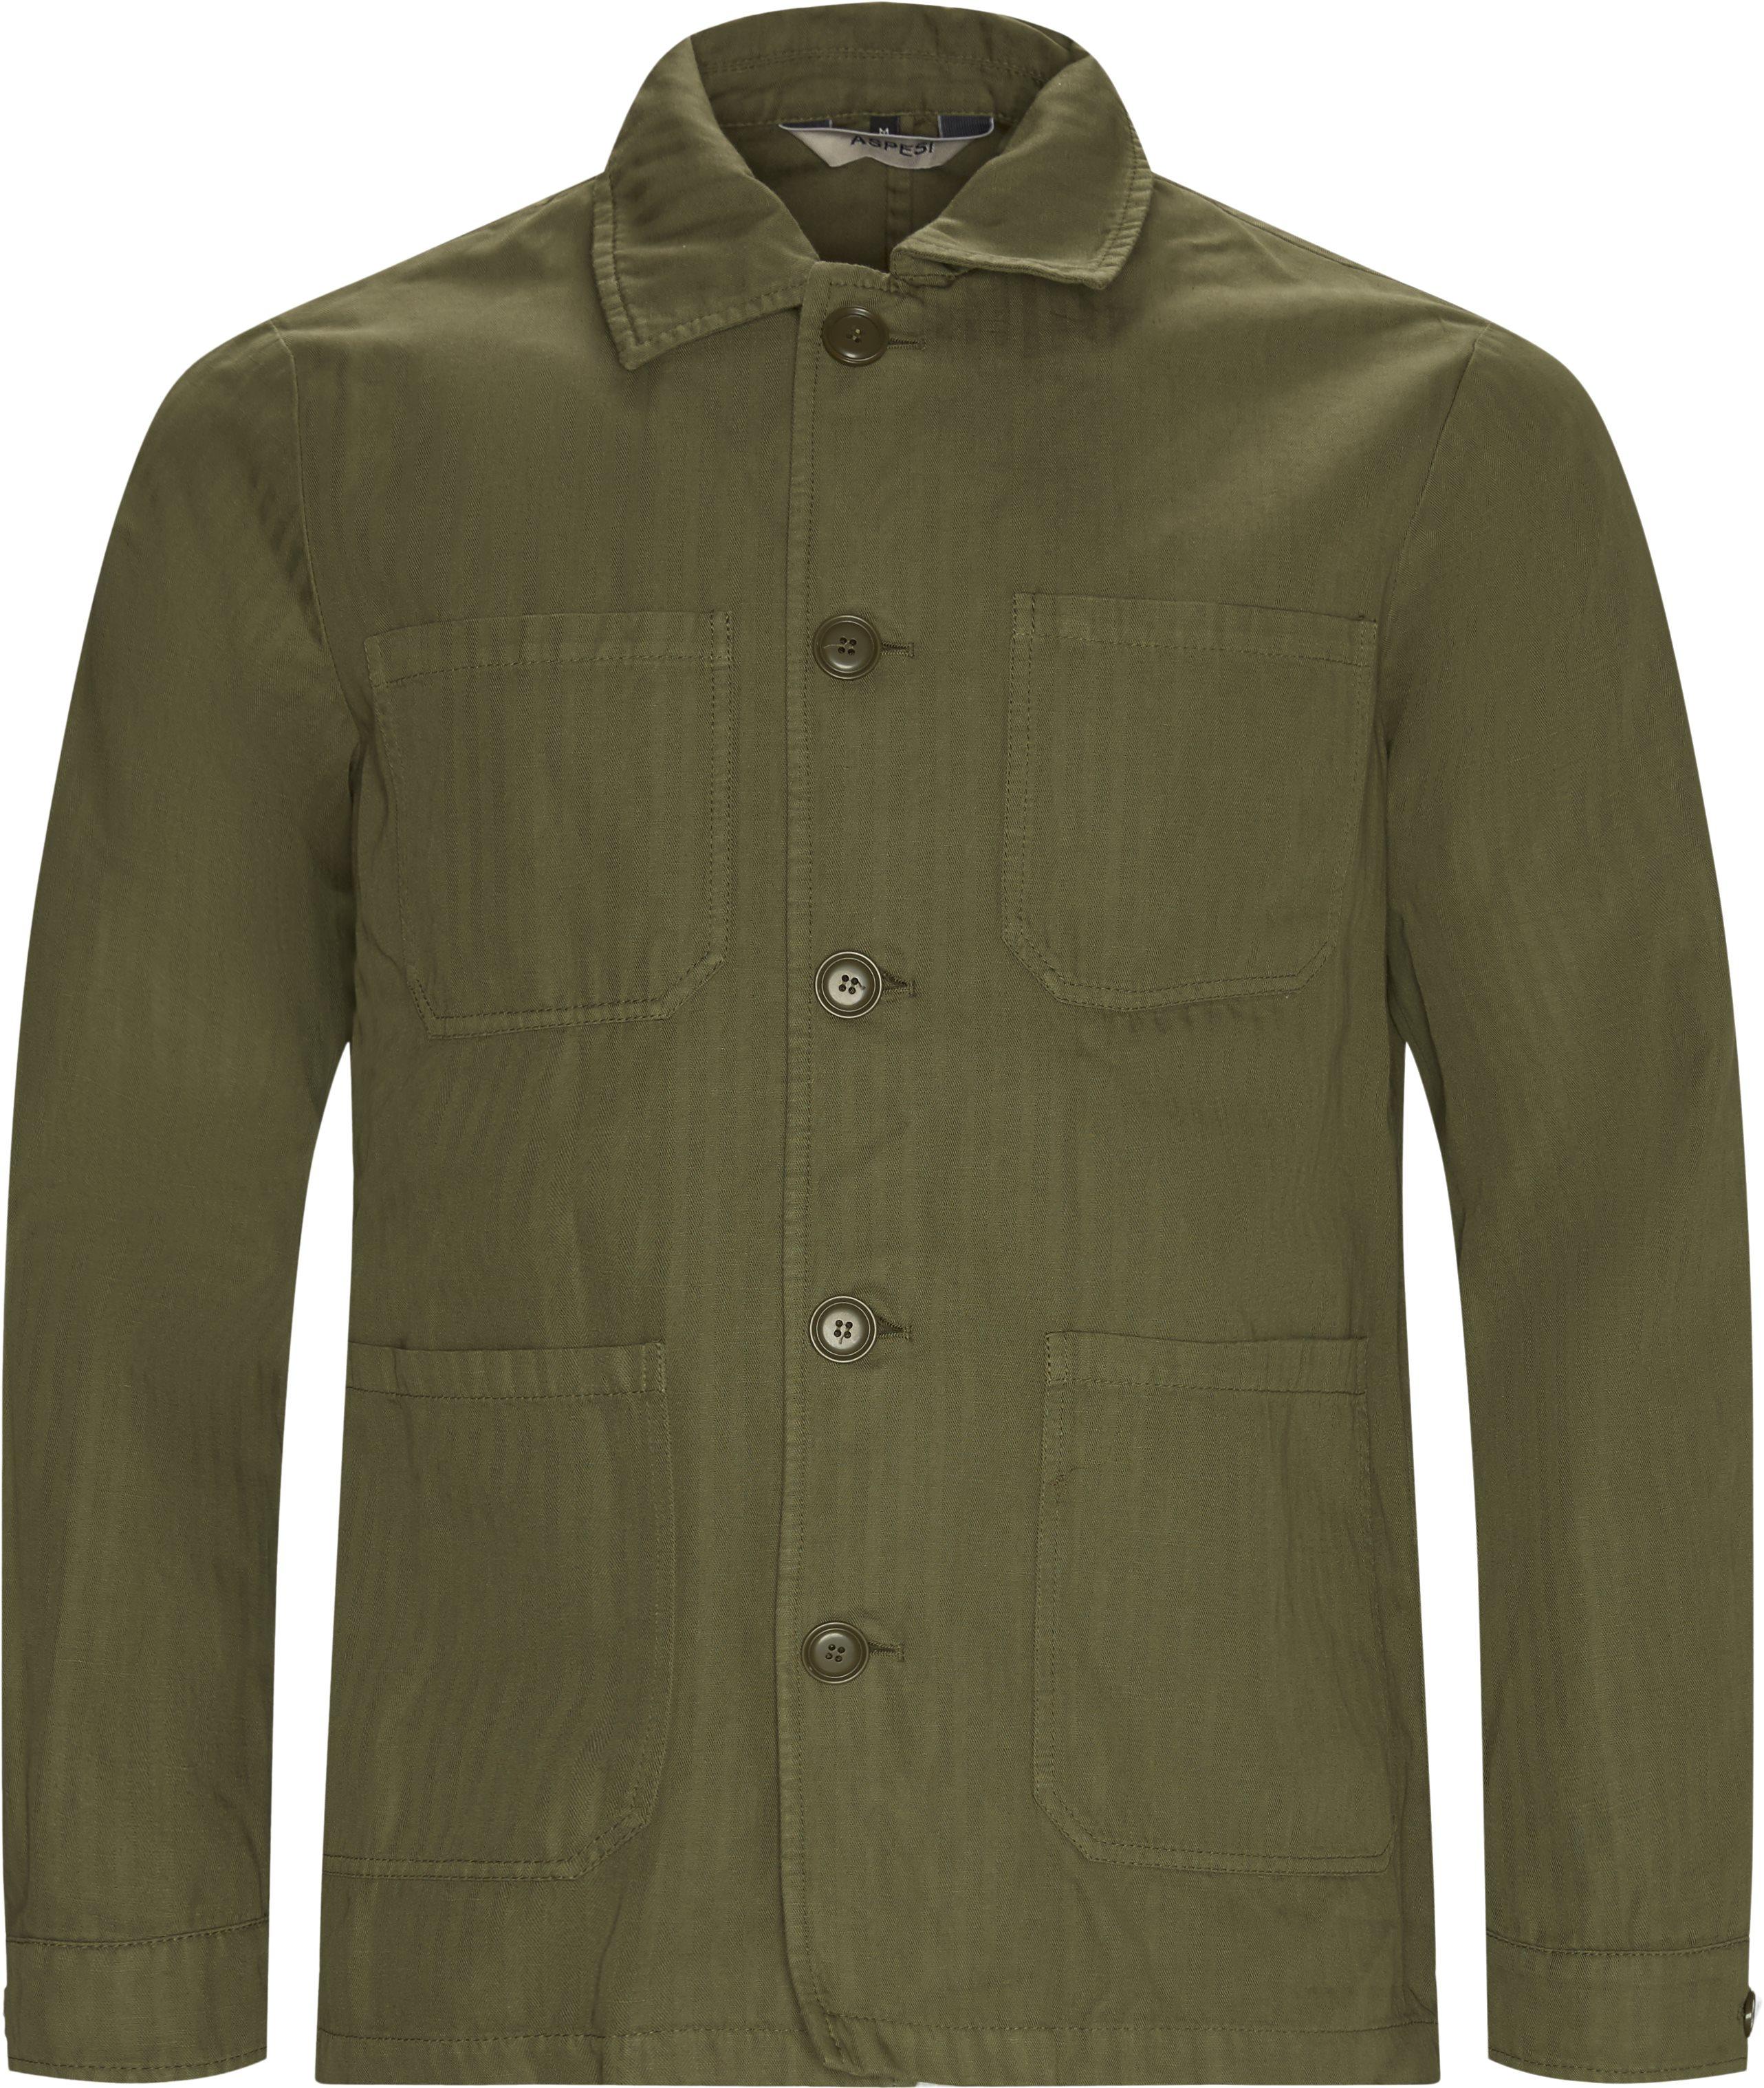 Overshirts - Regular fit - Army